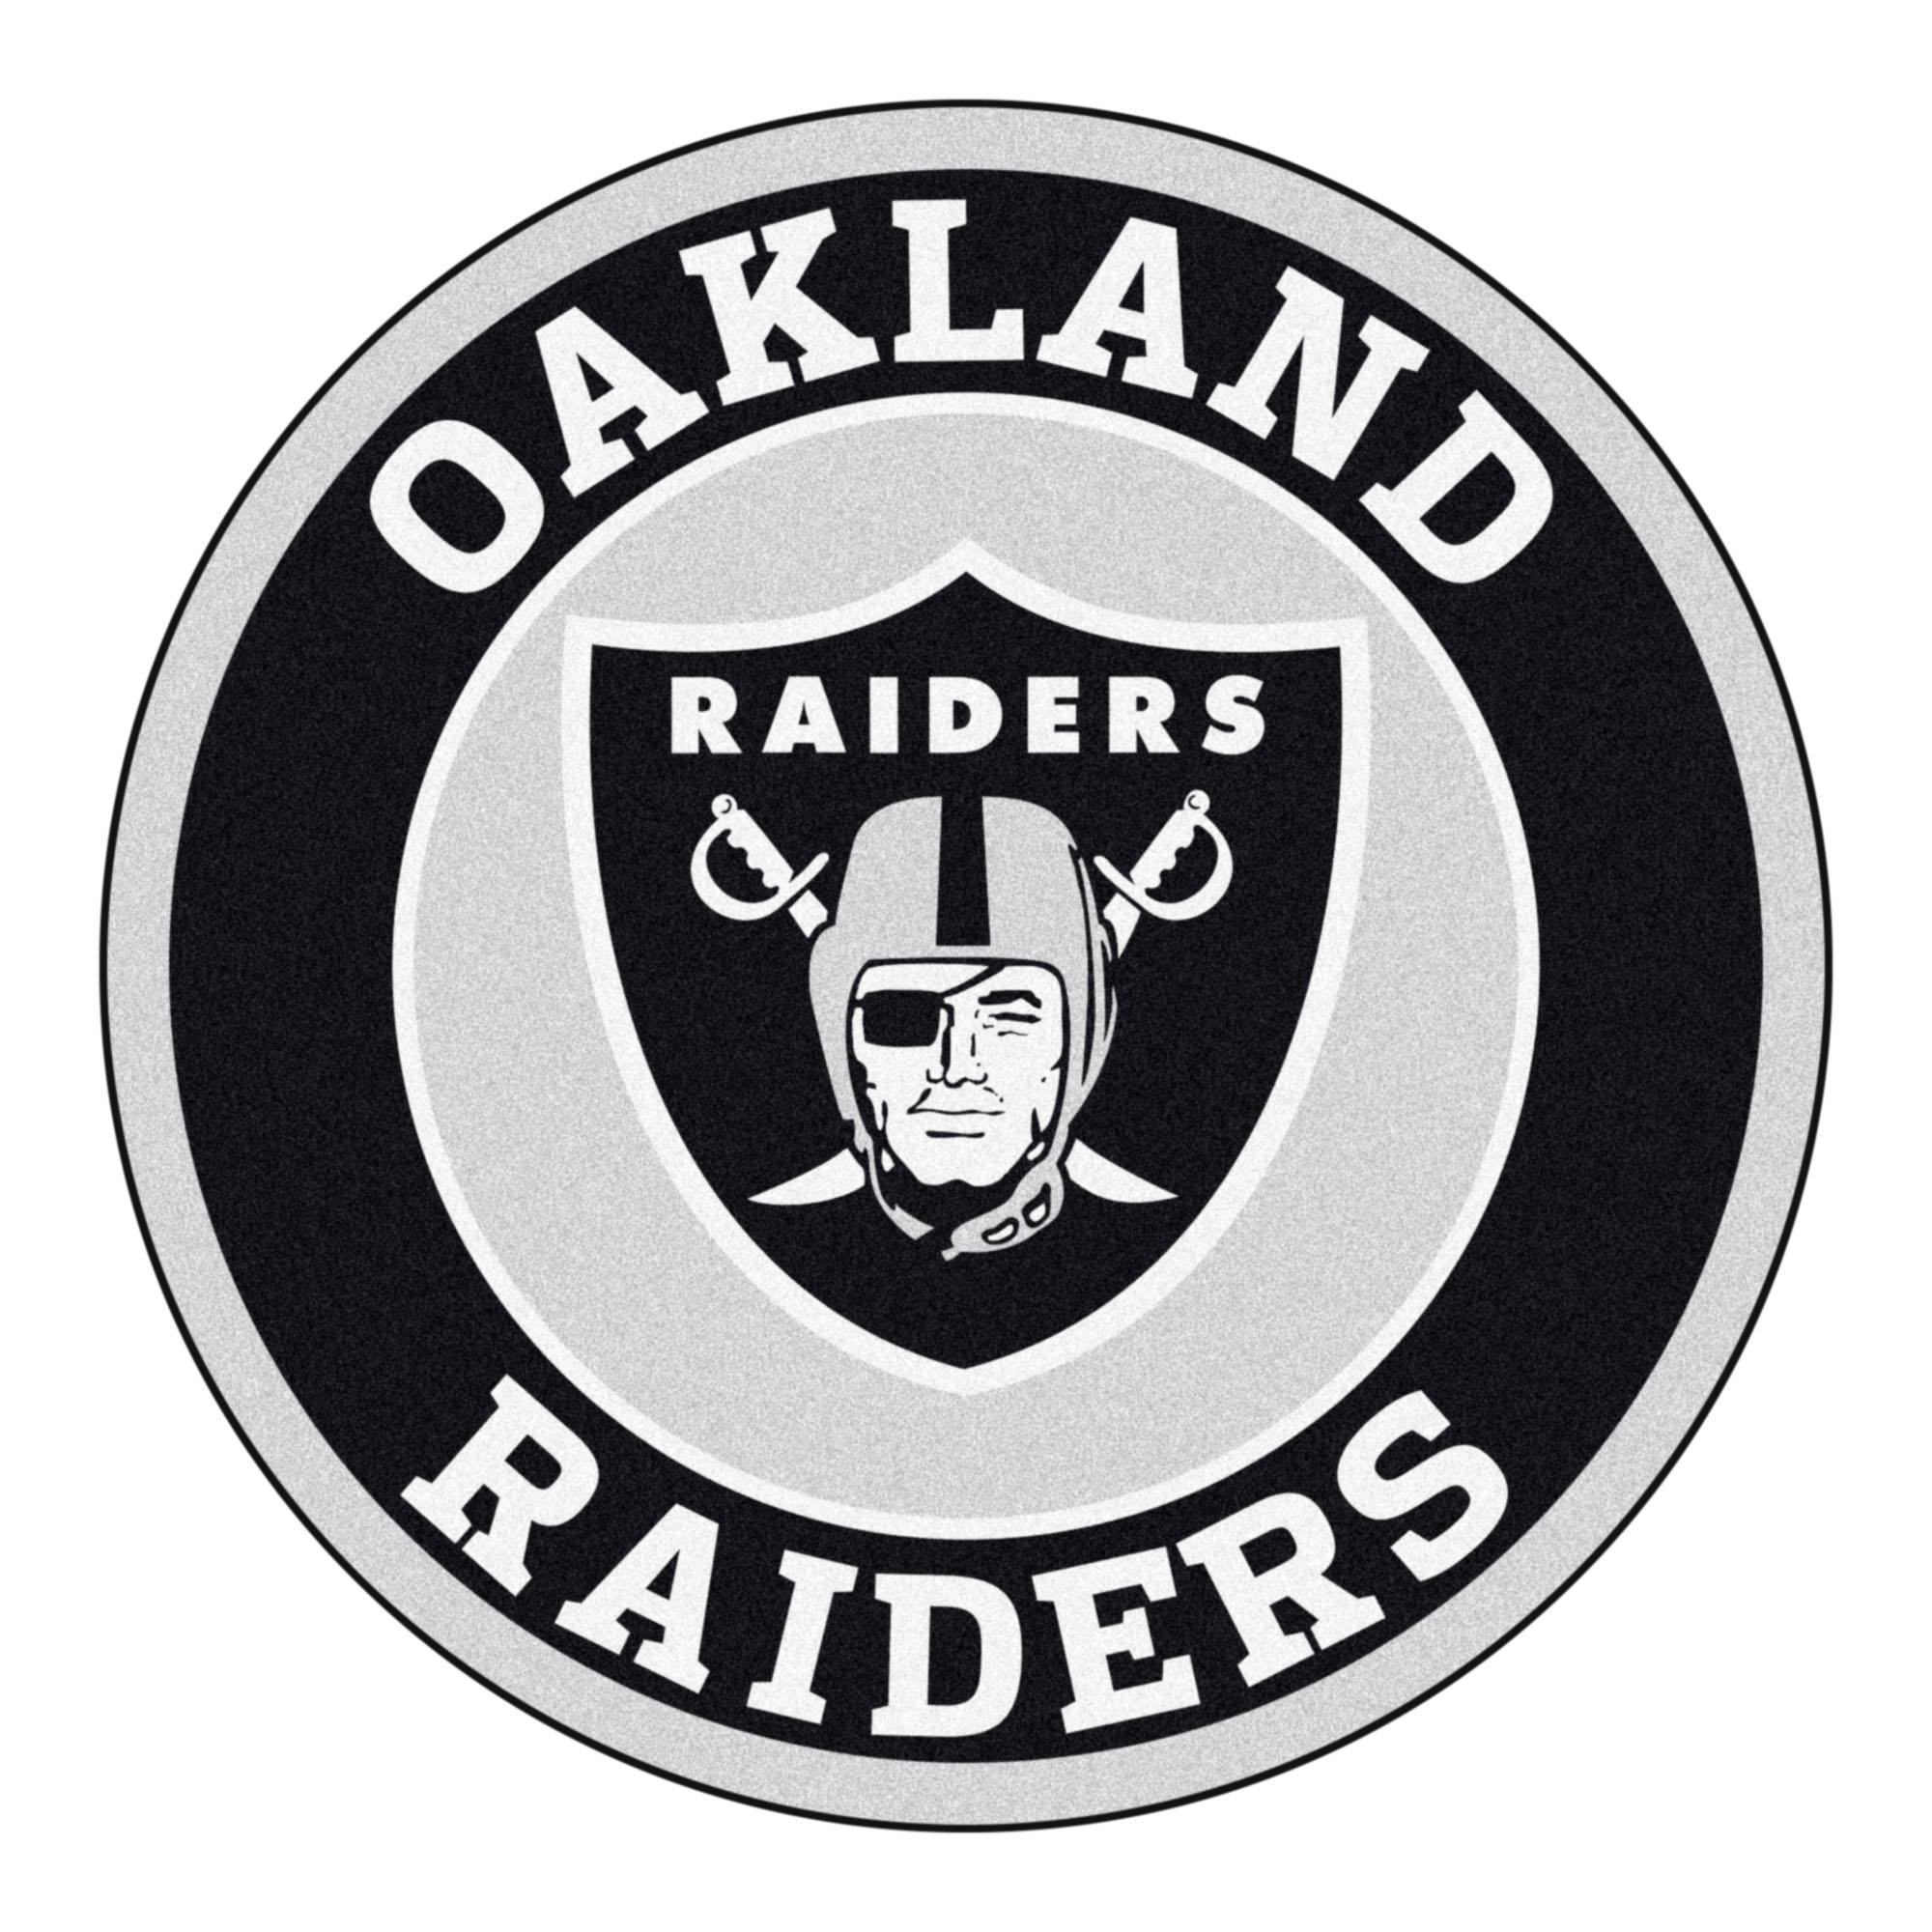 images oakland raiders logo   oakland raiders   pinterest   oakland